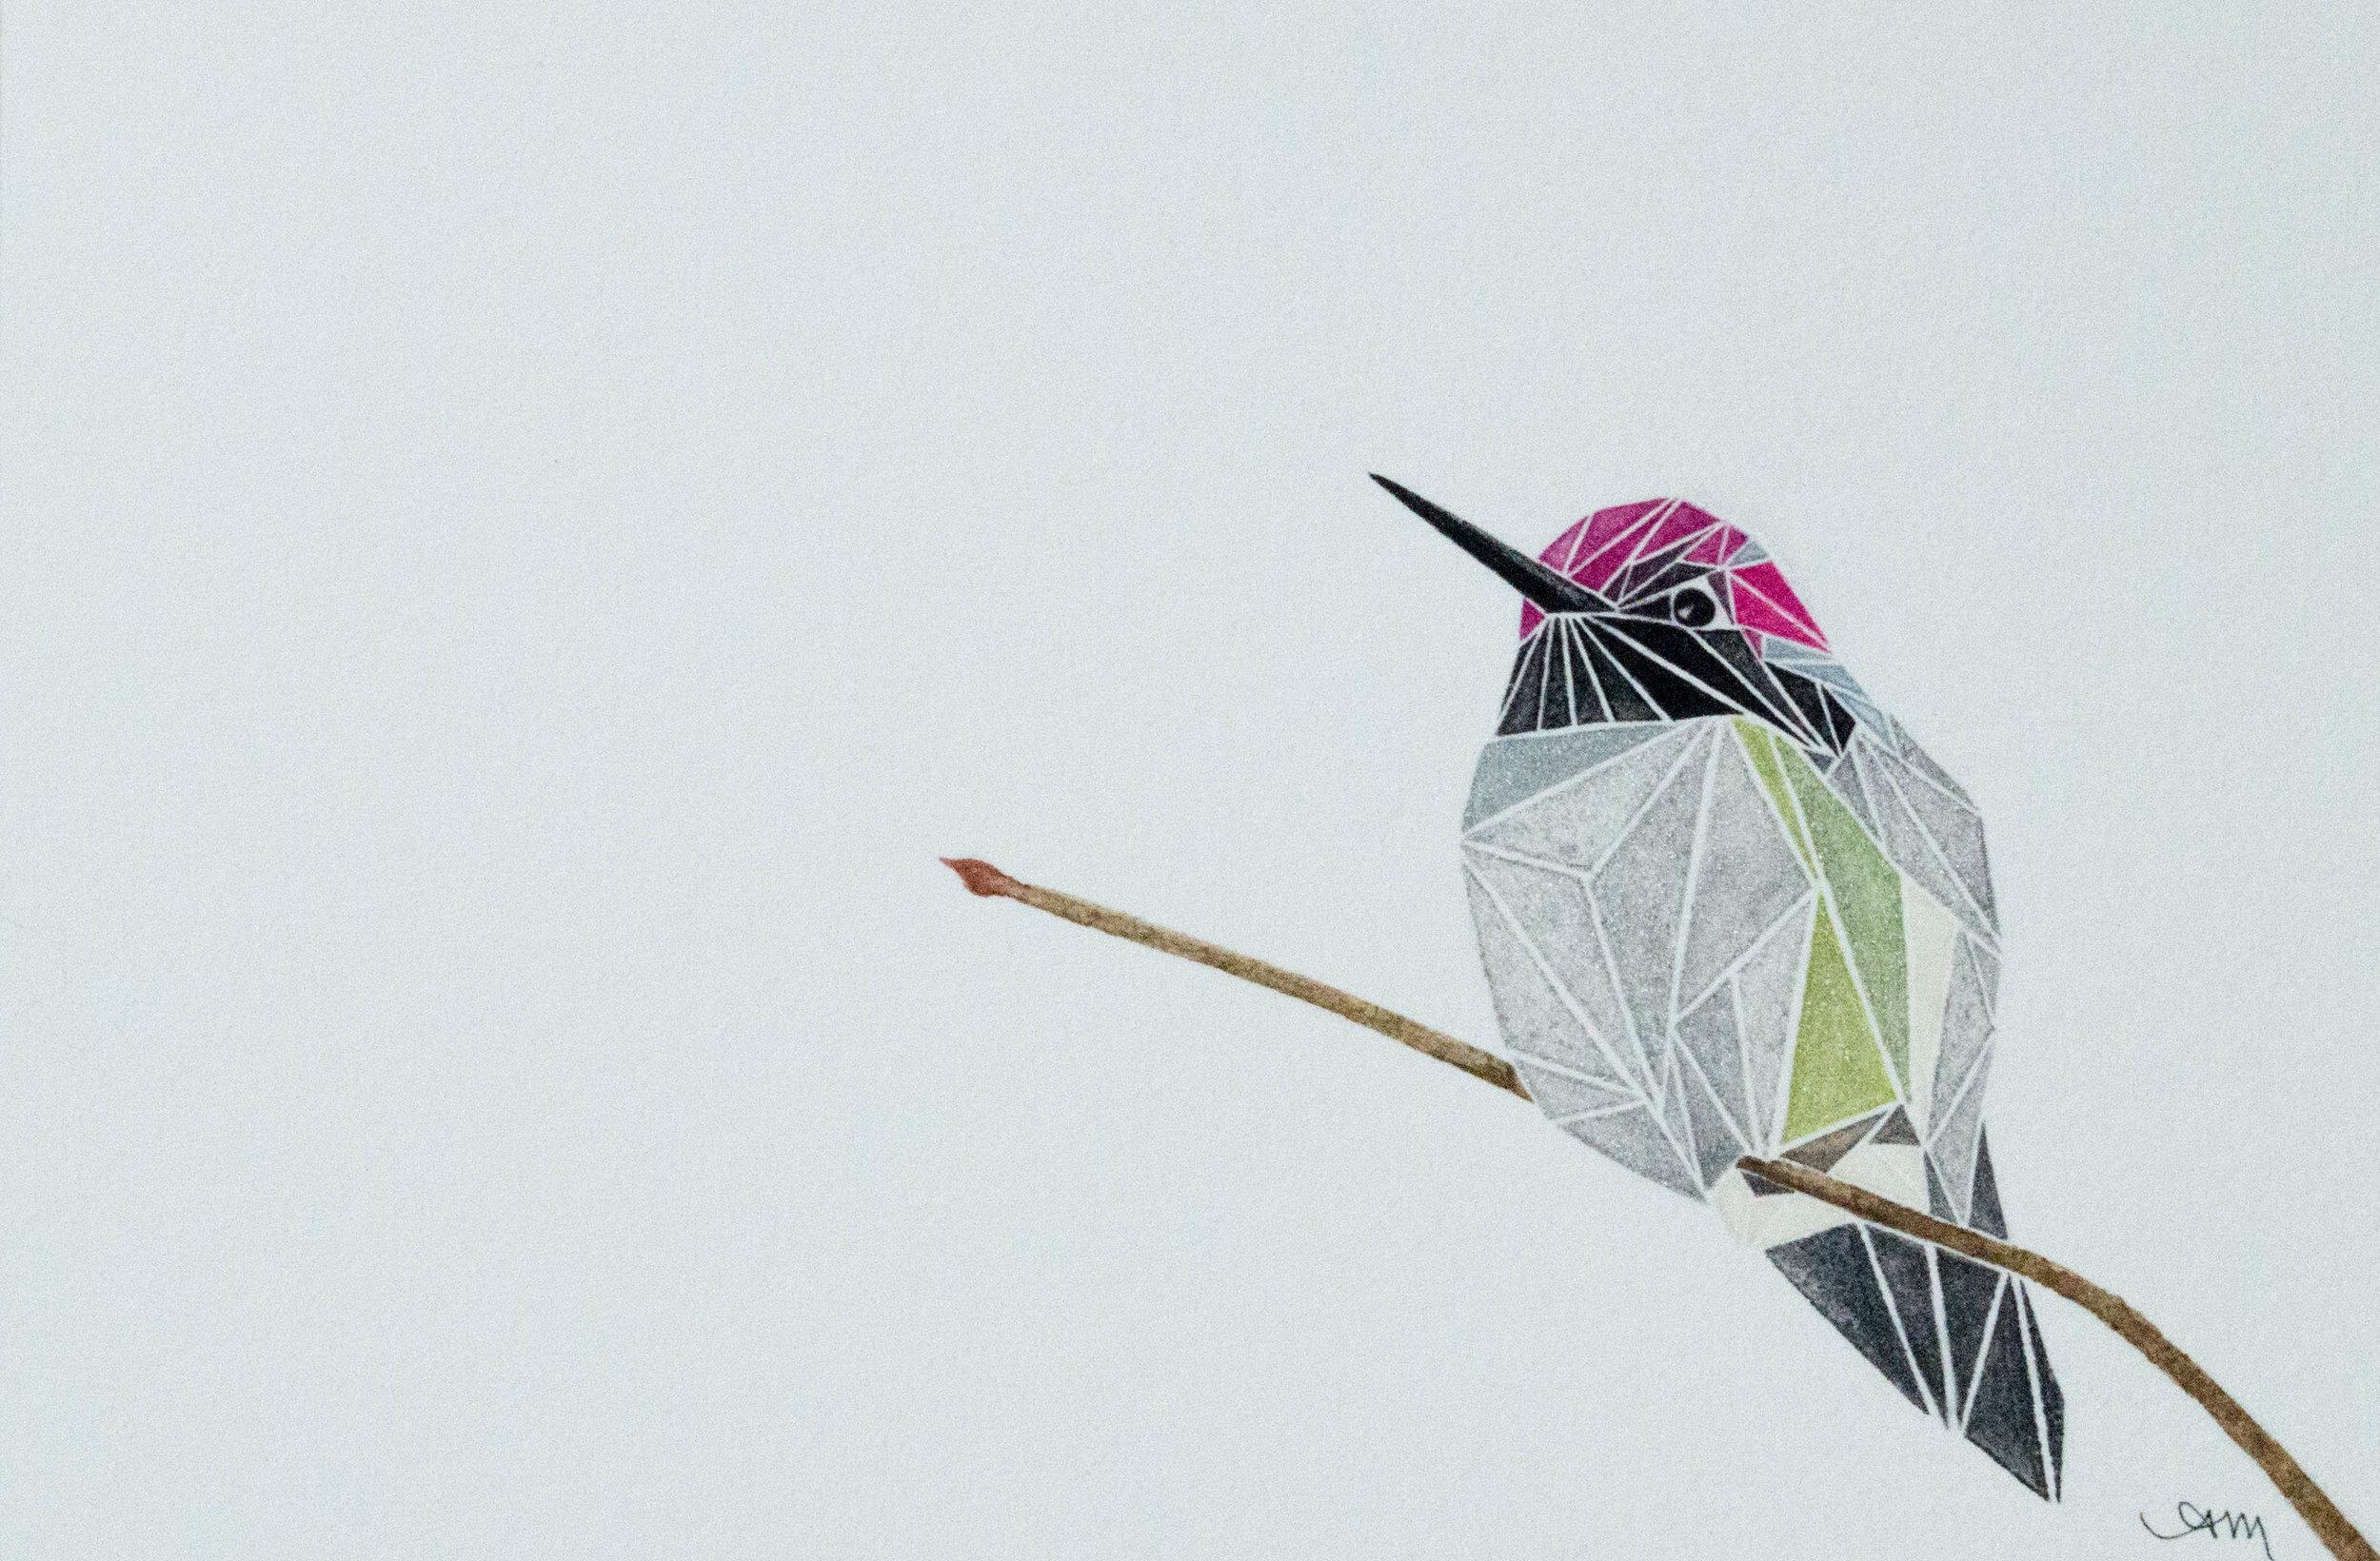 geometric anna's hummingbird, watercolor on paper - SOLD -